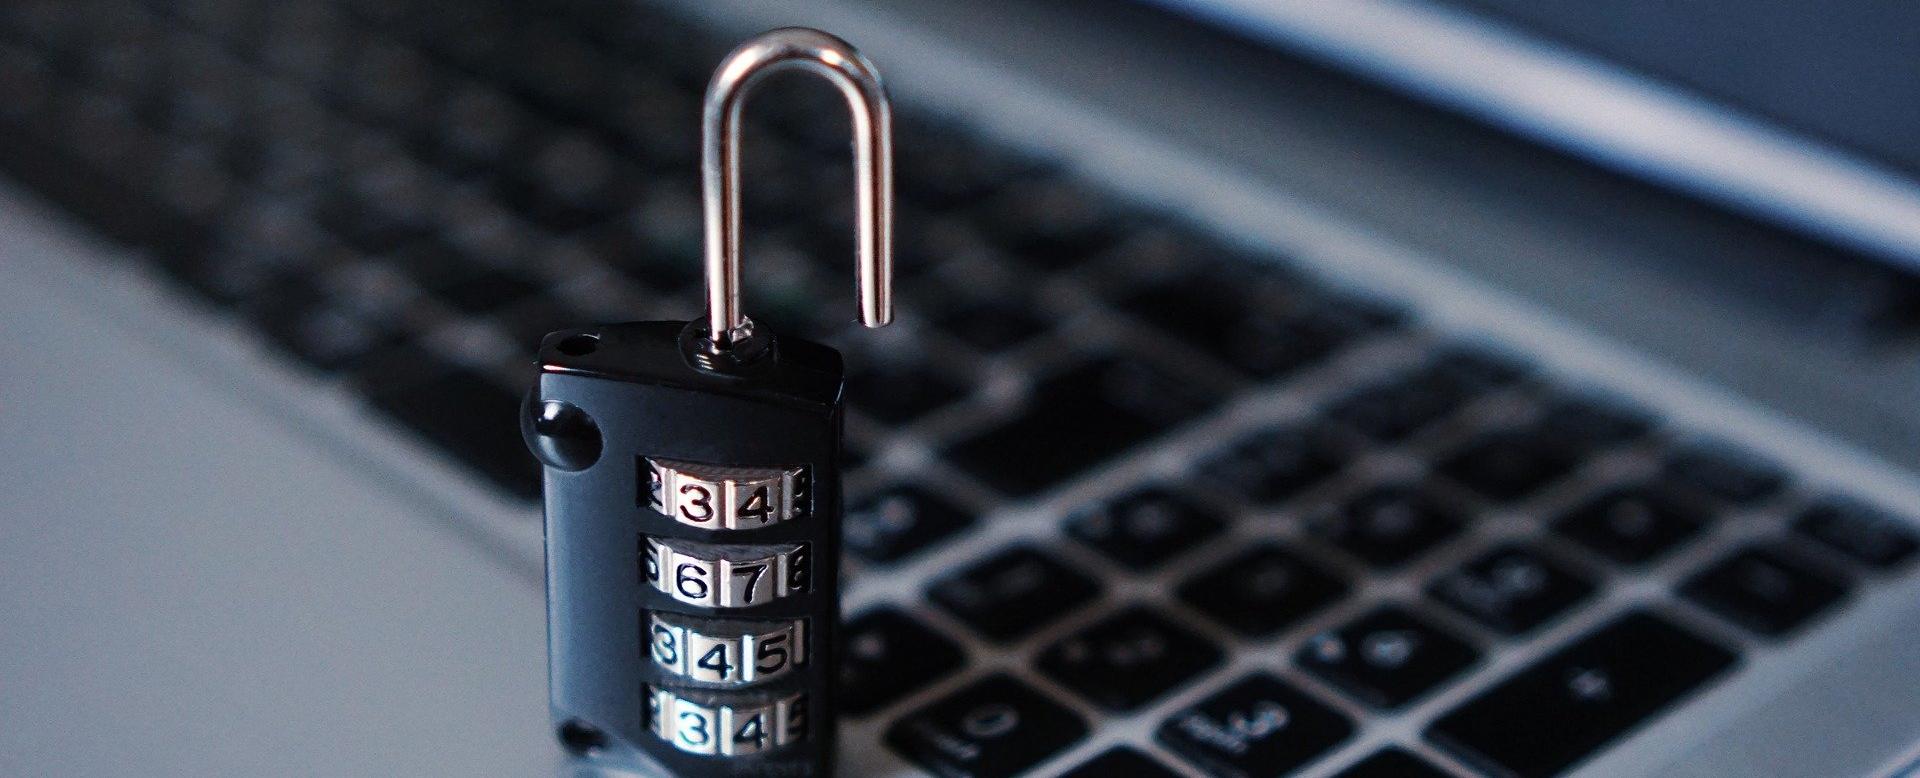 eco Verband: Mehr Cyber-Hygiene in Corona-Zeiten 1